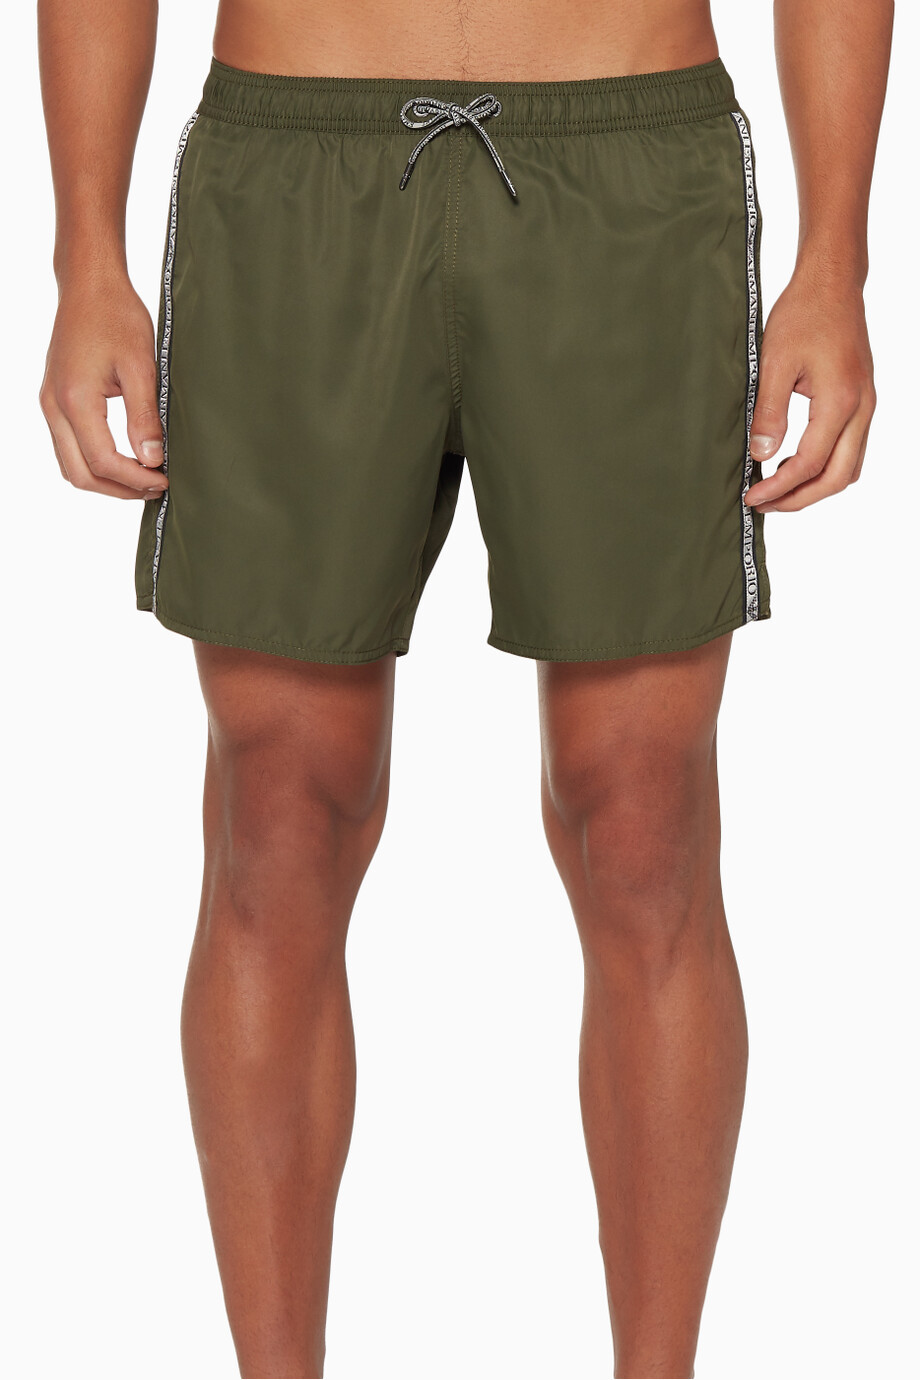 b6ae1d1daccaa Shop Emporio Armani Neutral Logo Tape Swim Shorts for Men | Ounass ...